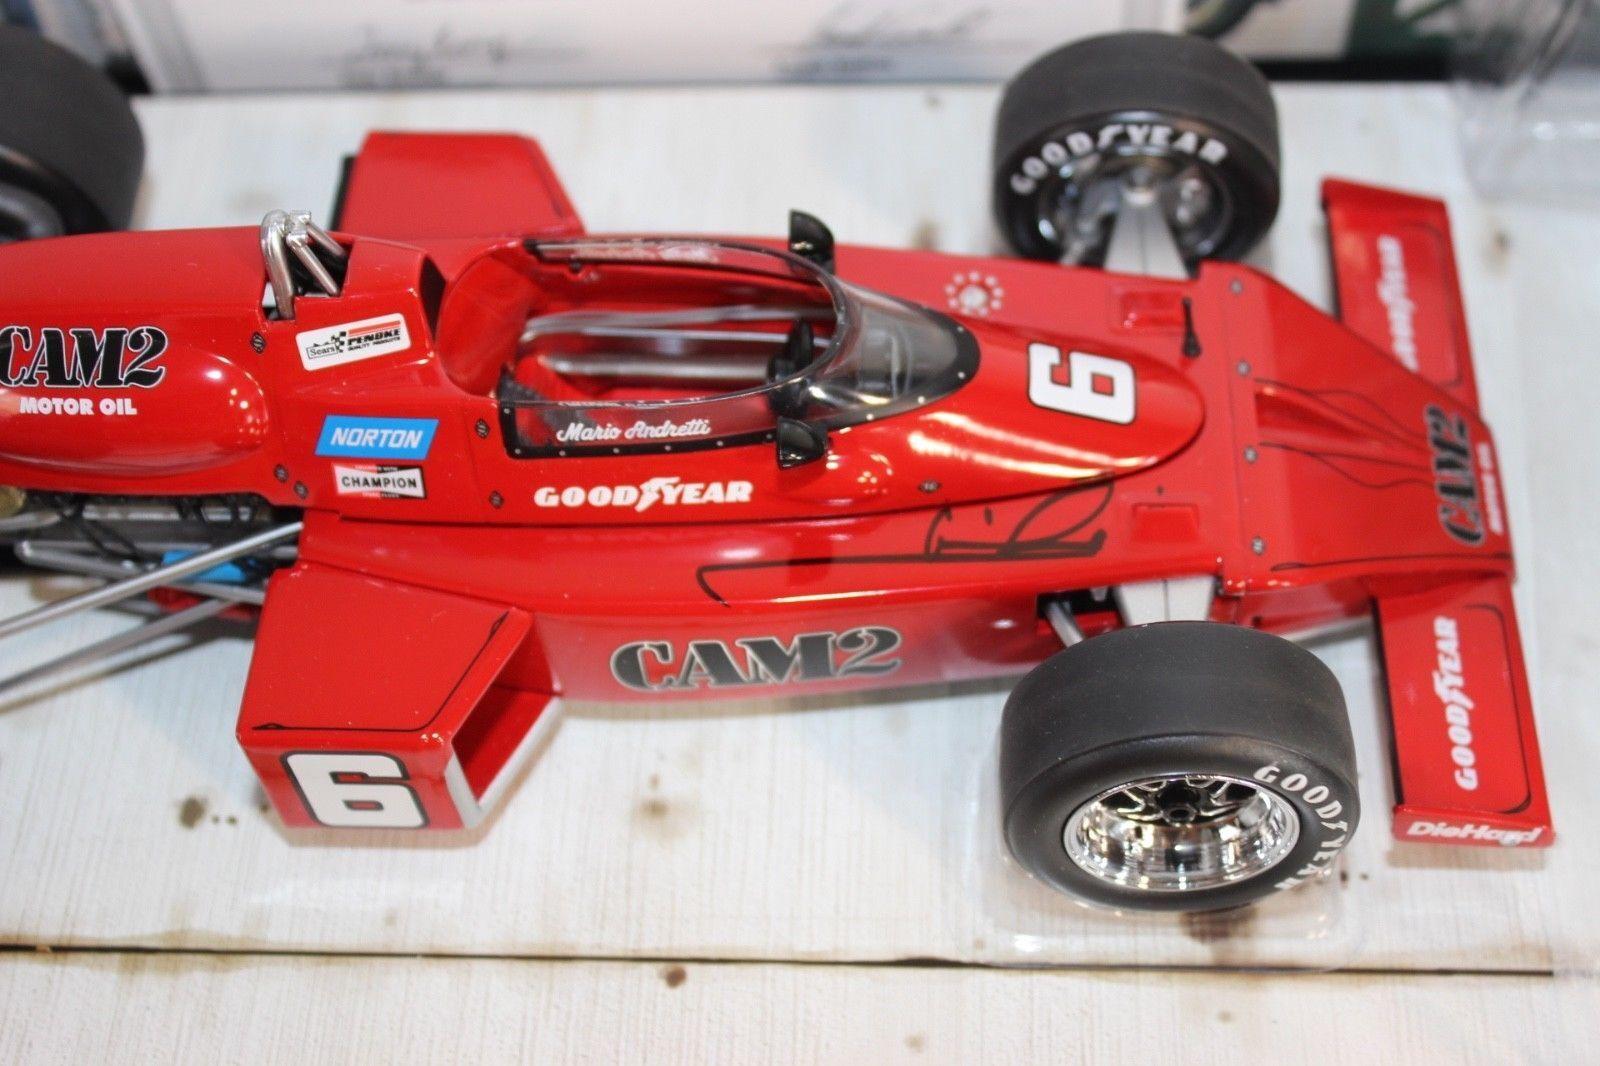 in vendita online autoousel 1 1976 Mario eretti eretti eretti SIGNED Penske McLaren 16 race auto Indy 500 1 18  outlet online